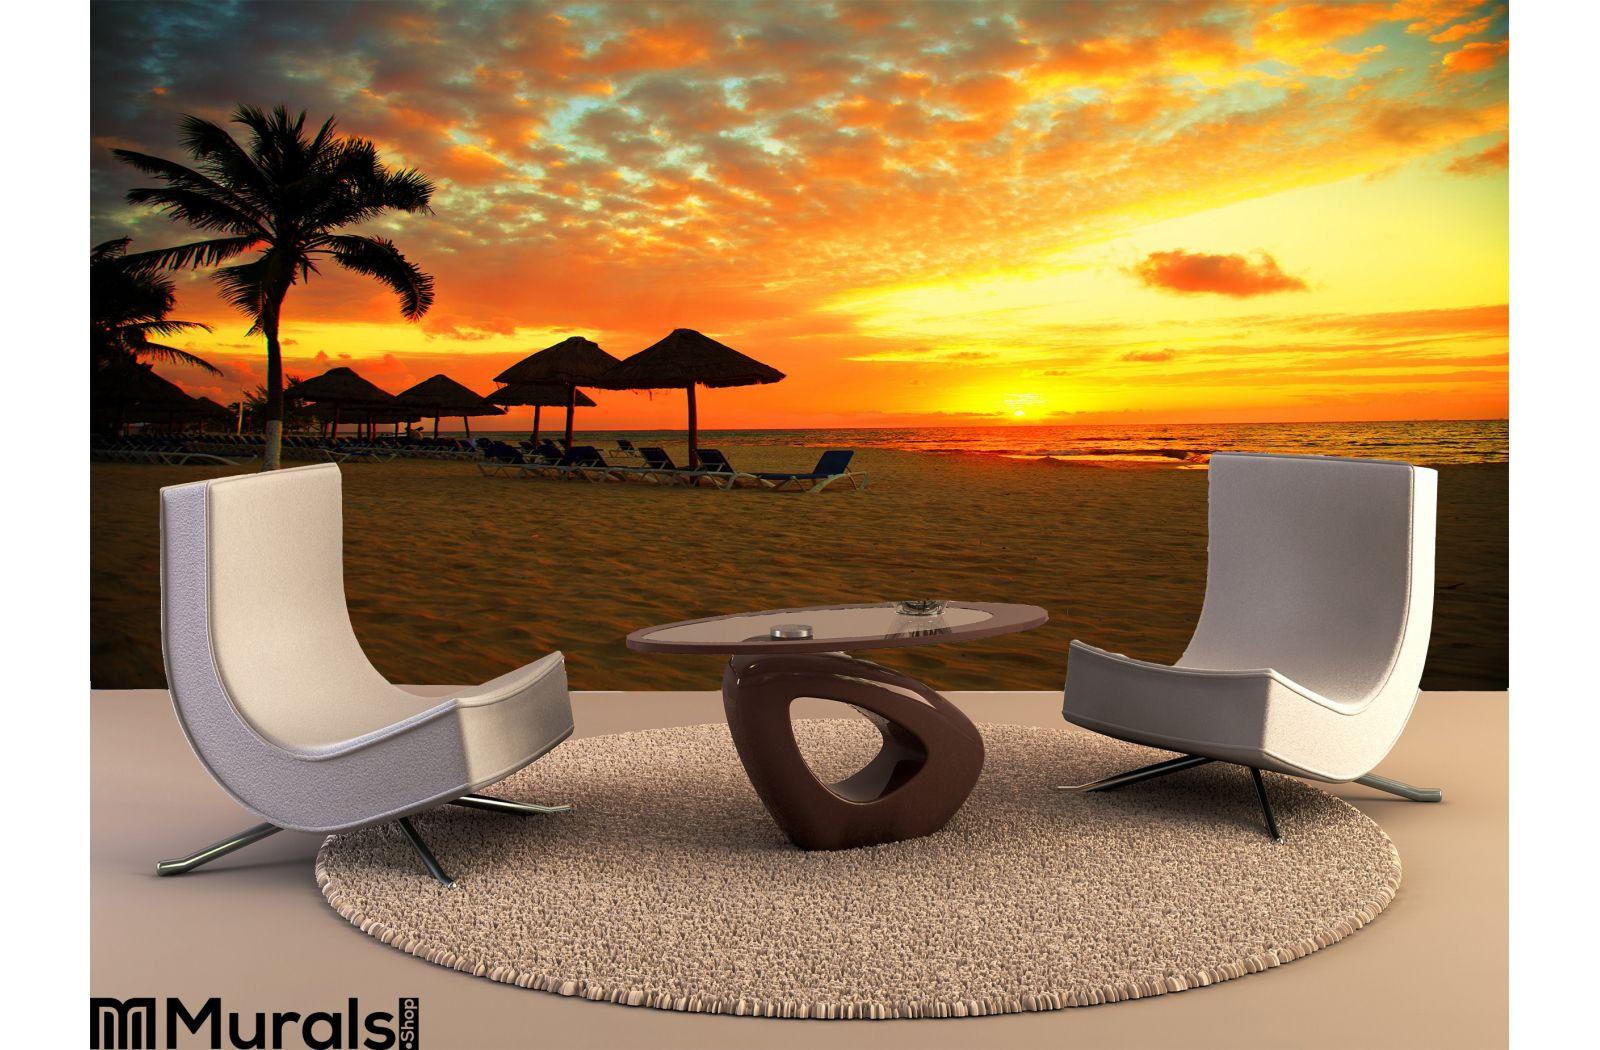 Sunset Scene Tropical Beach Resort Wall Mural